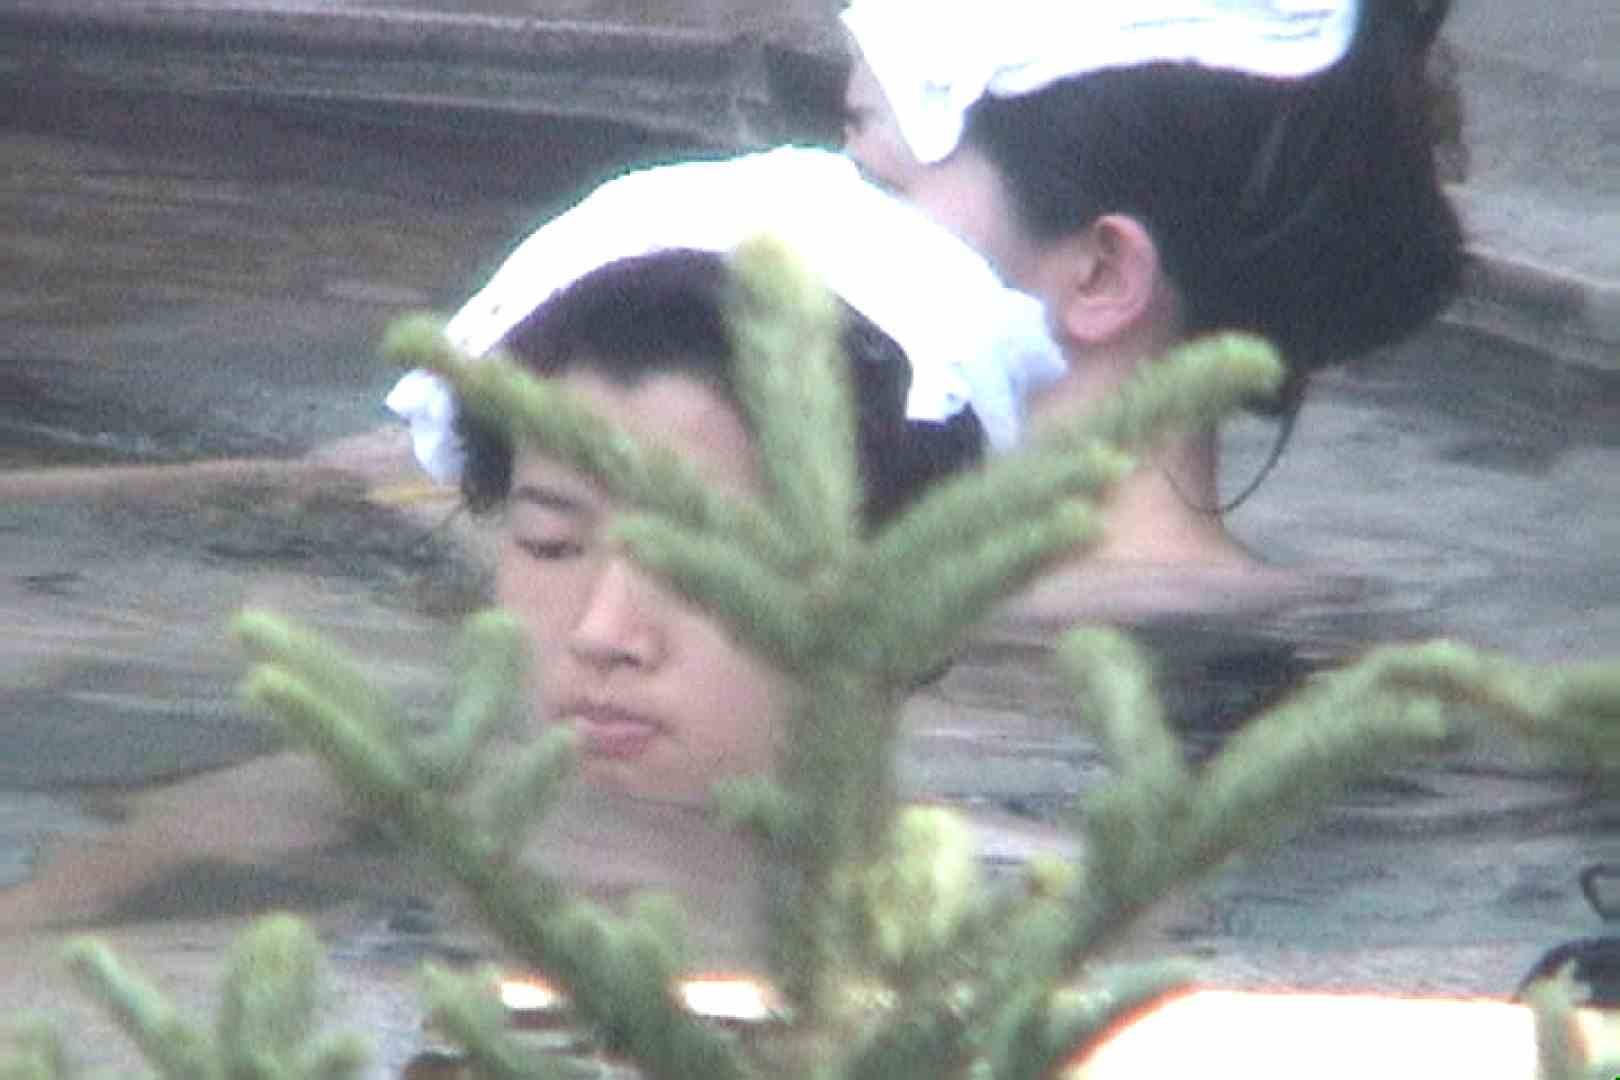 Aquaな露天風呂Vol.80【VIP限定】 盗撮 | HなOL  66pic 39